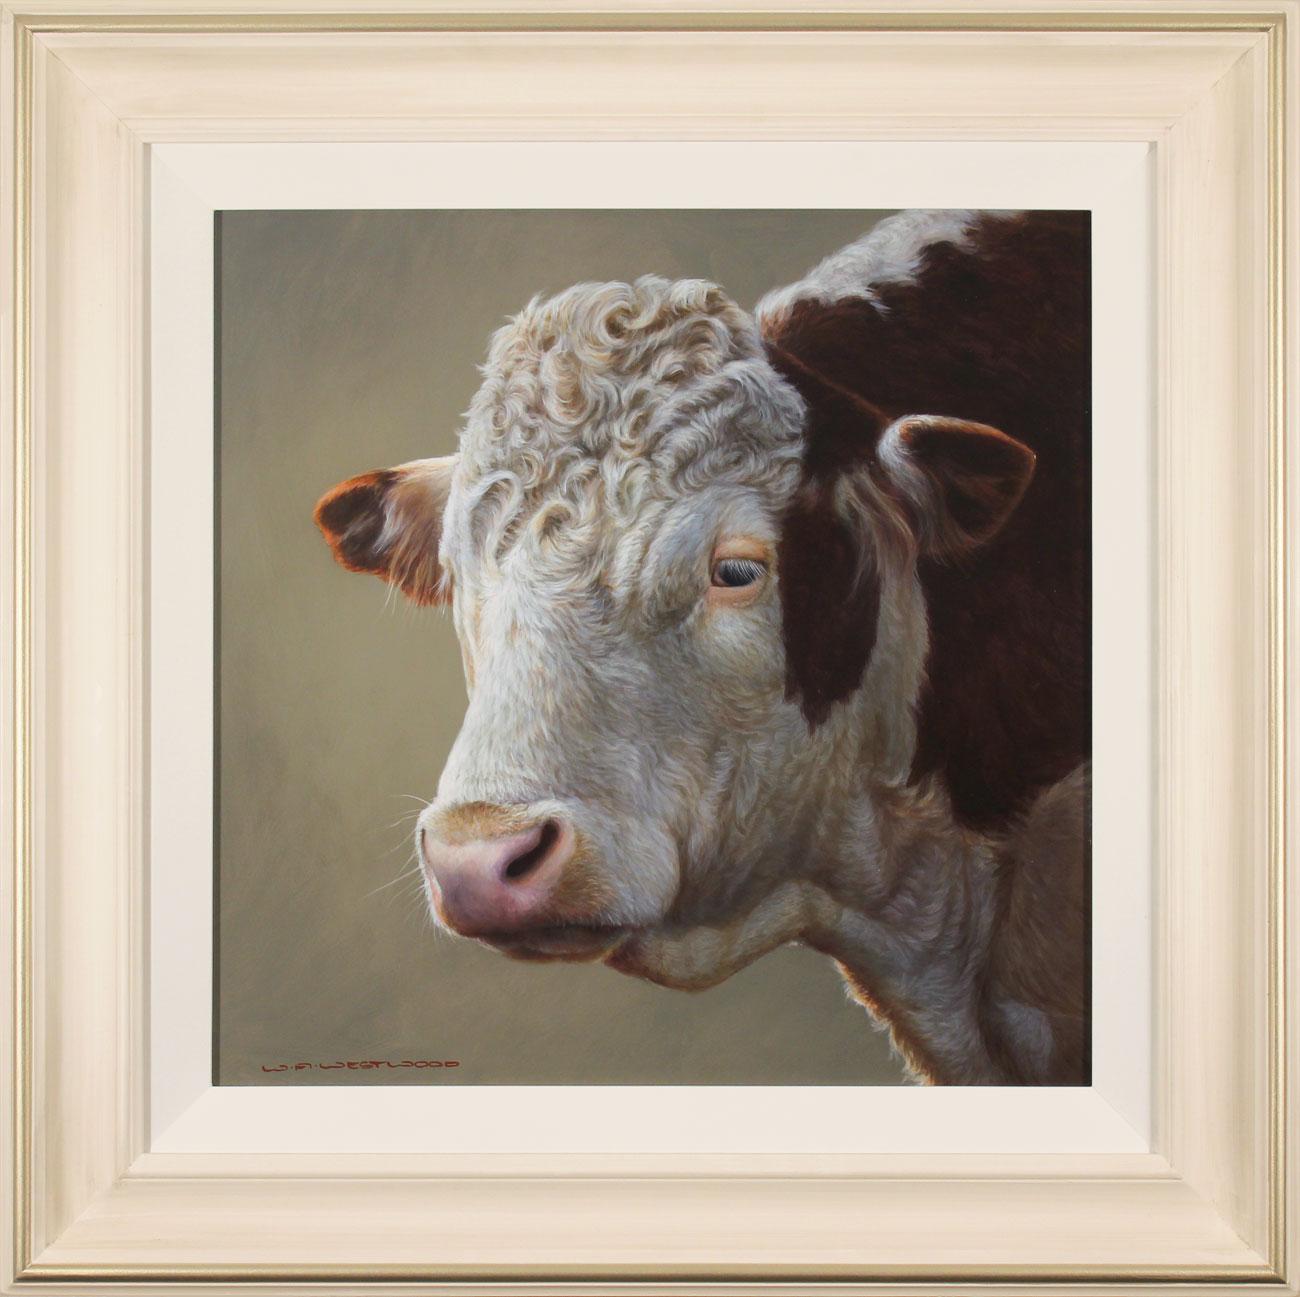 Wayne Westwood, Original oil painting on panel, Hereford Bull Click to enlarge